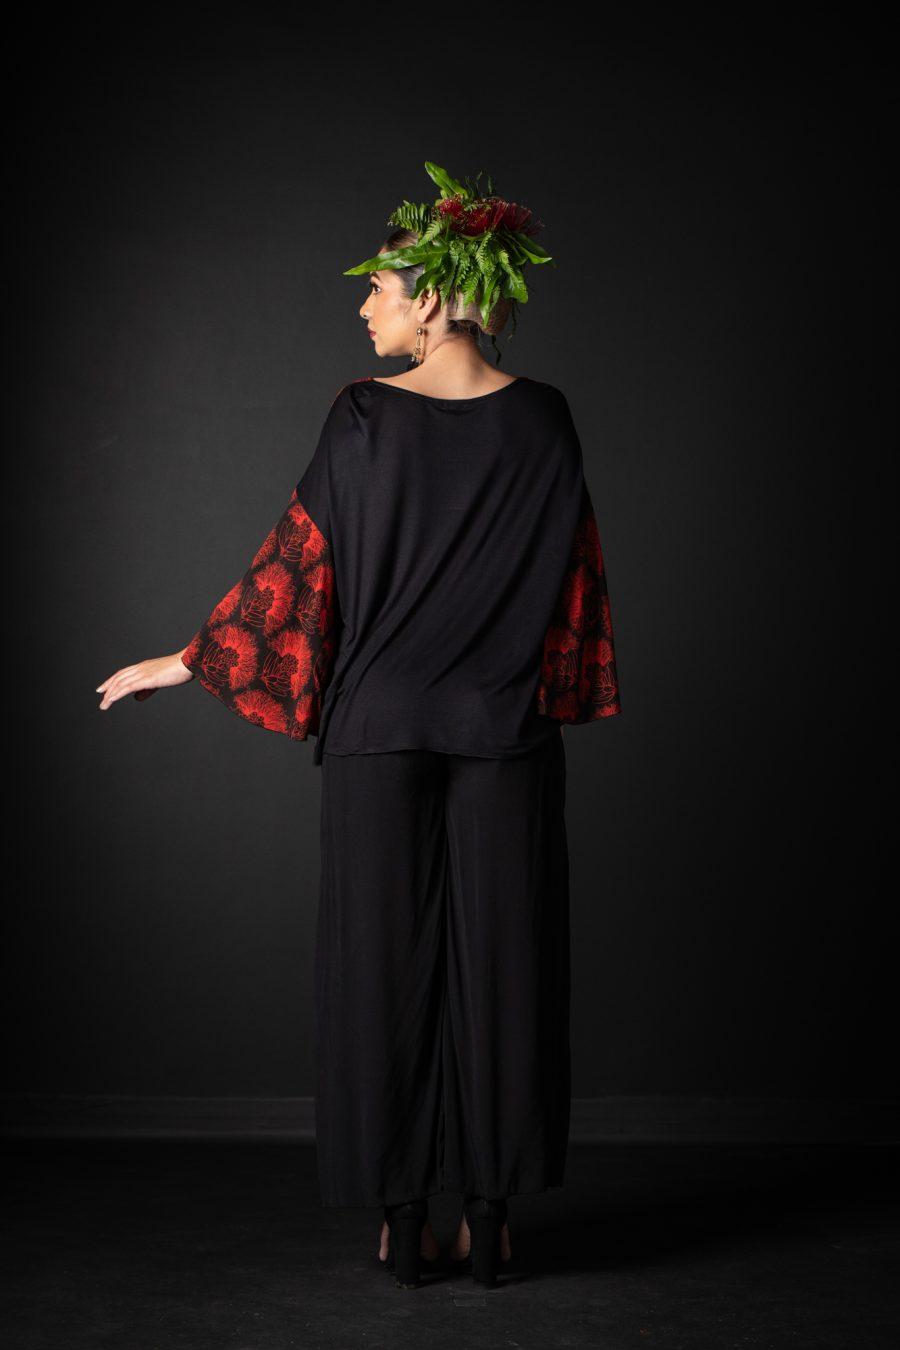 Model wearing Hoolaulea Top in Firey Red Black Kaleilehua Pattern - Back View